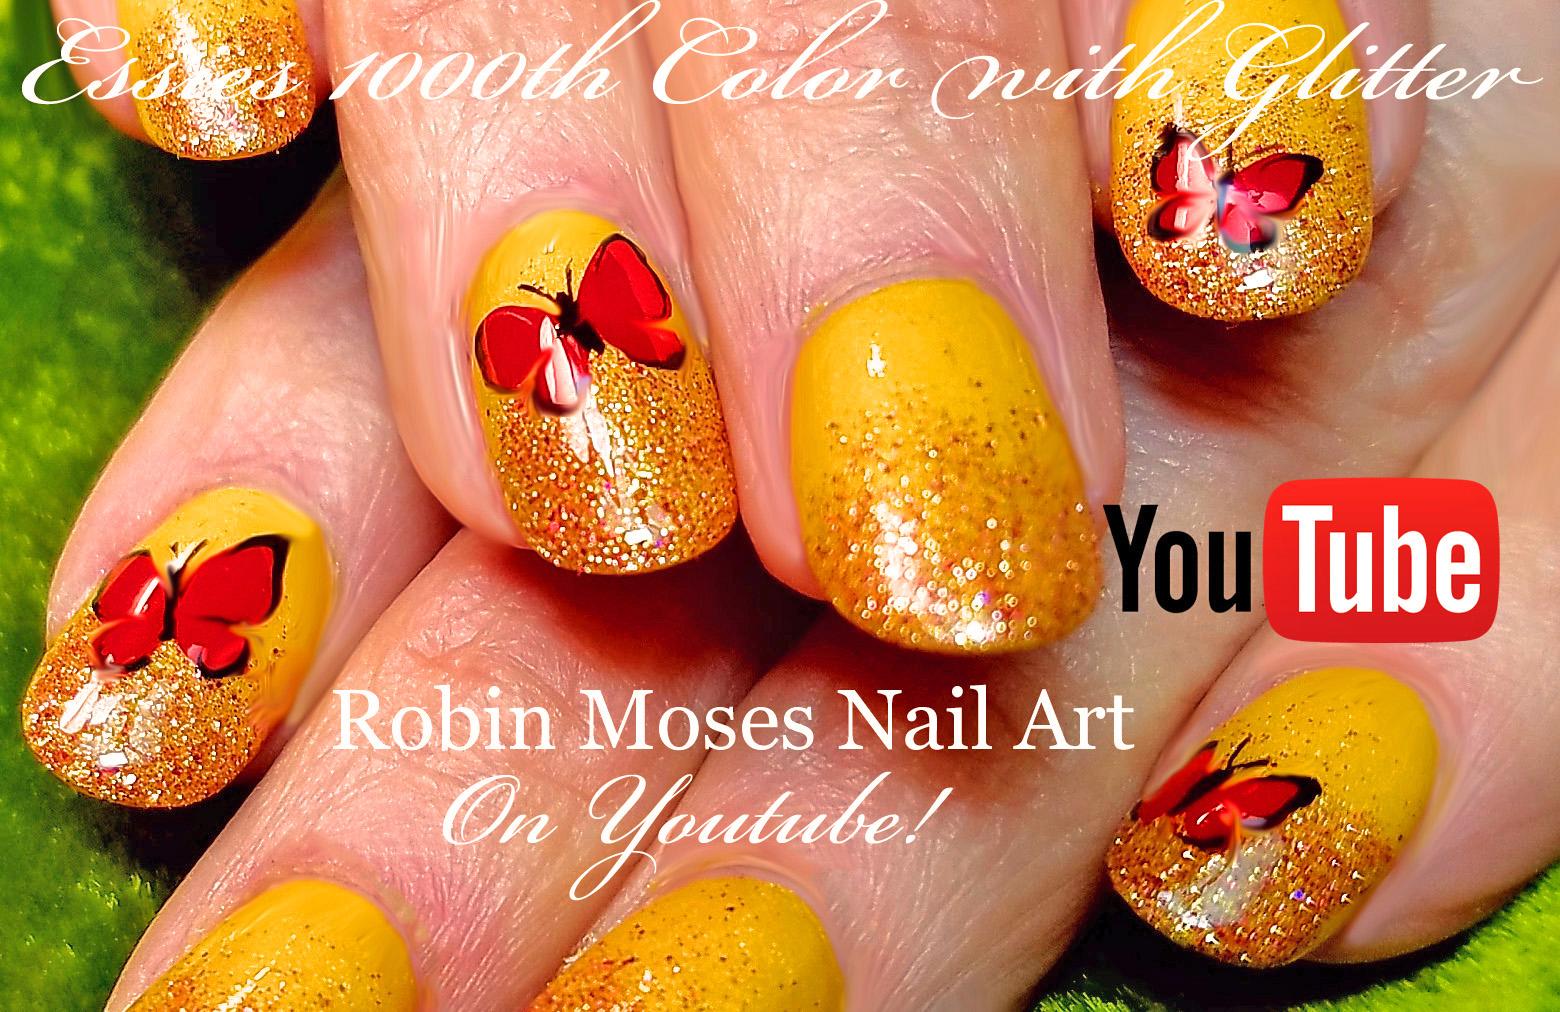 Nail Art by Robin Moses: ESSIE 1000 Polish Holo Glitter Gold ...